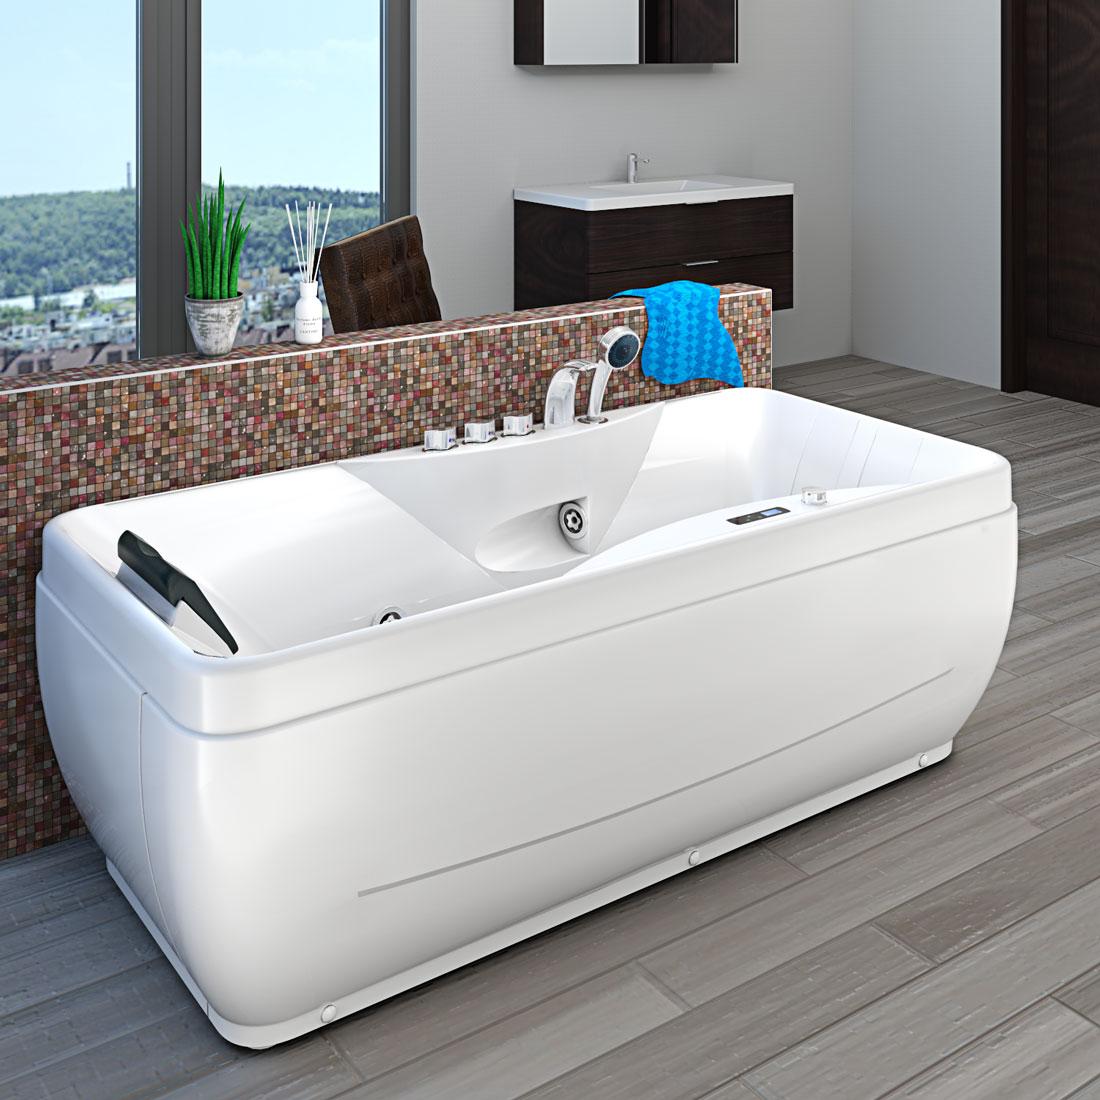 acquavapore whirlpool vollausstattung pool badewanne wanne a1149 pl 170x80cm. Black Bedroom Furniture Sets. Home Design Ideas